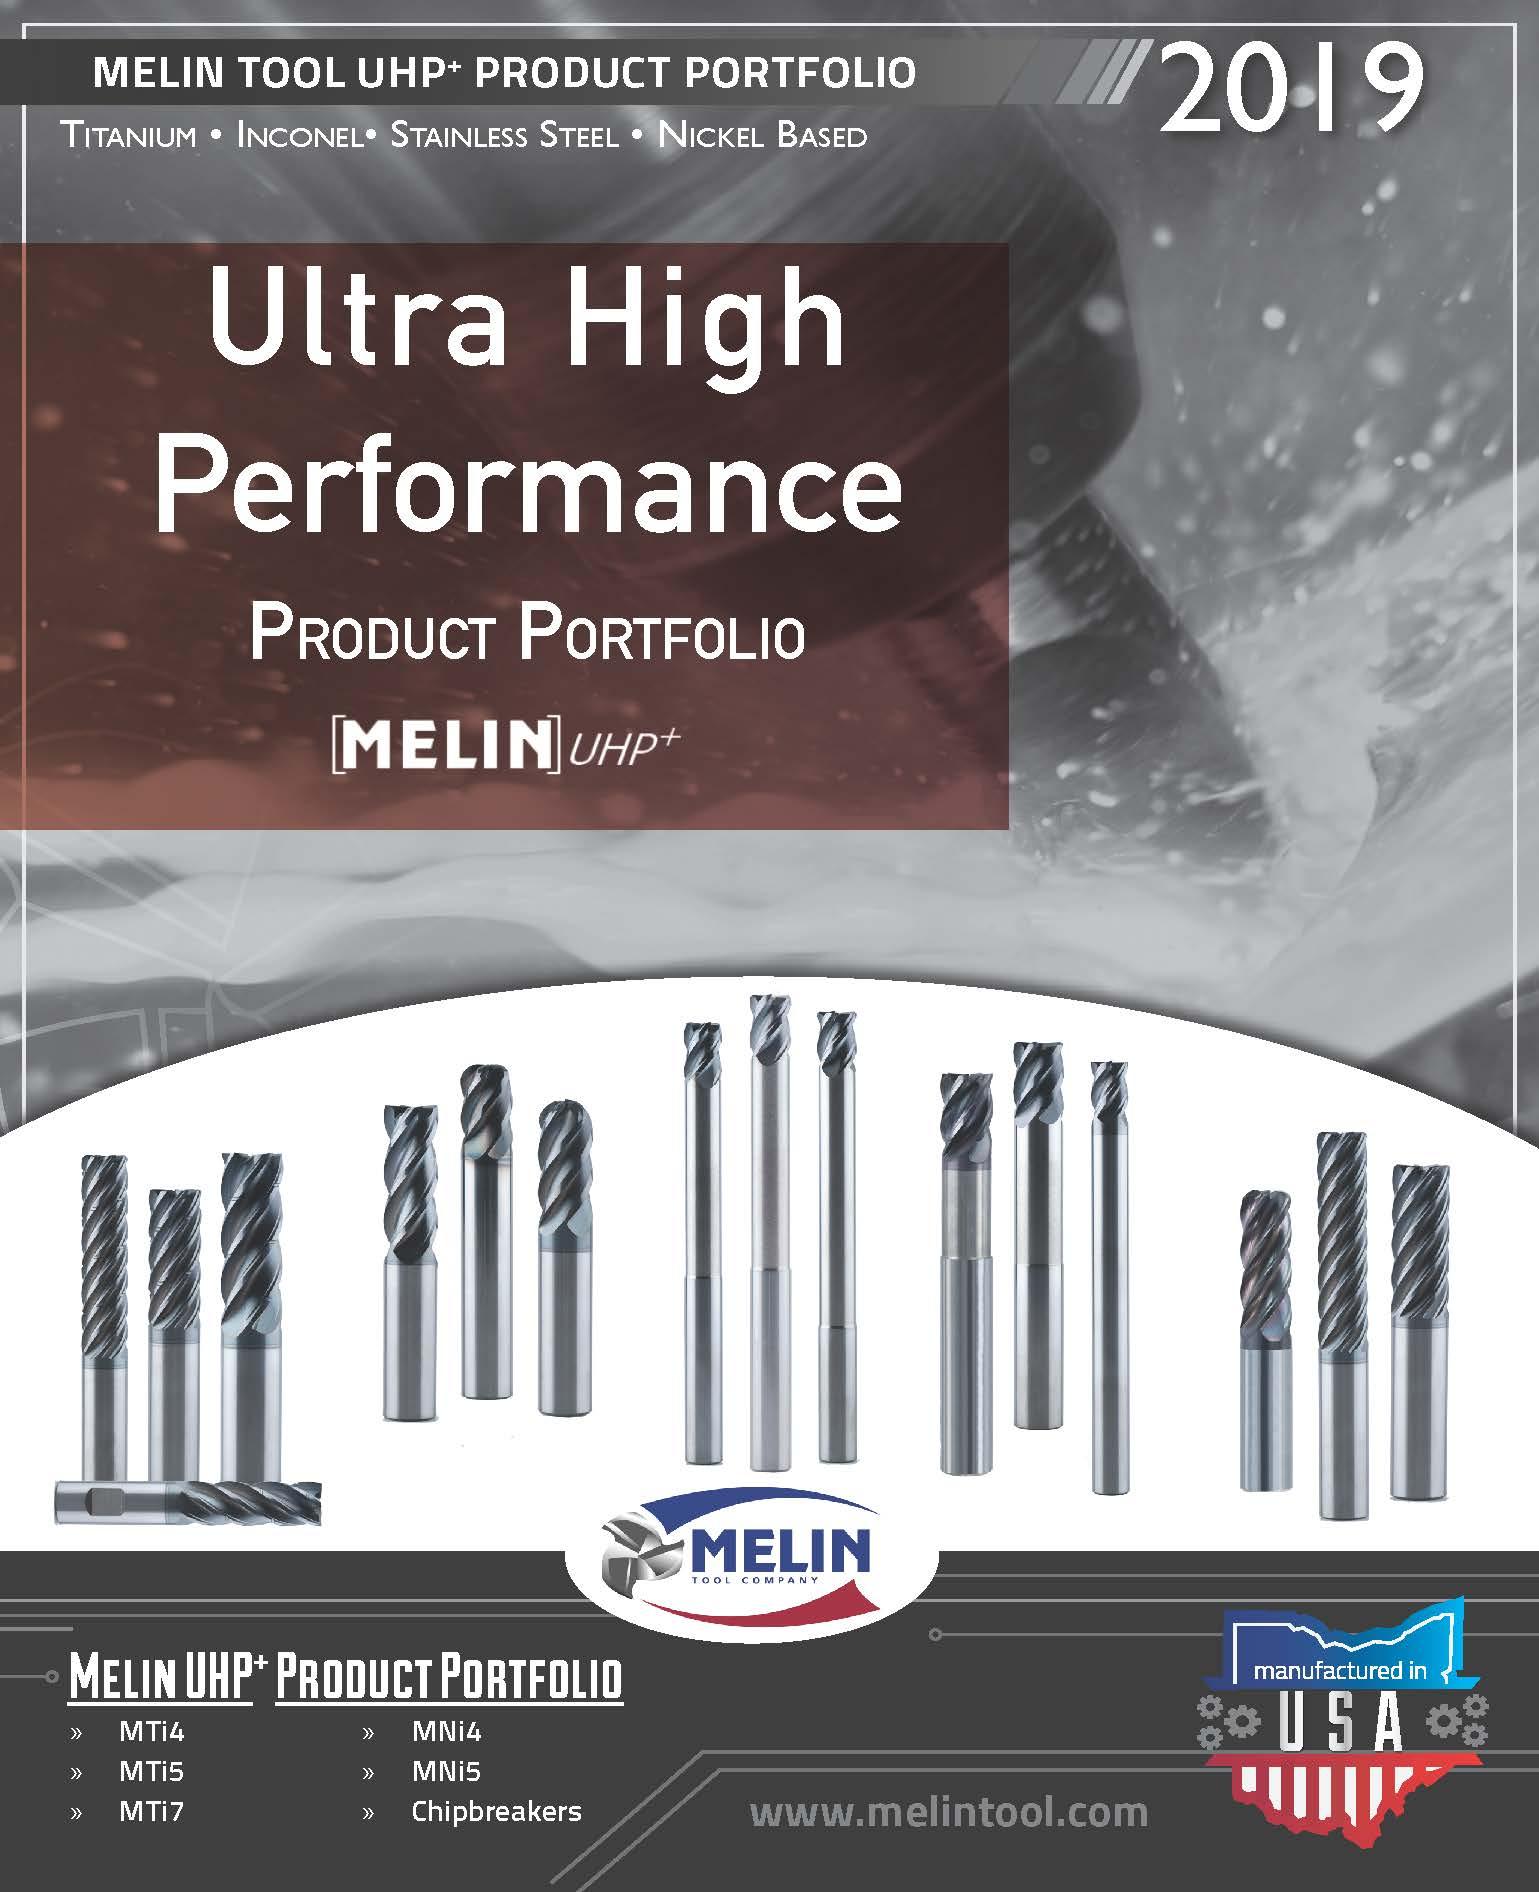 Melin Ultra High Performance Product Portfolio Brochure